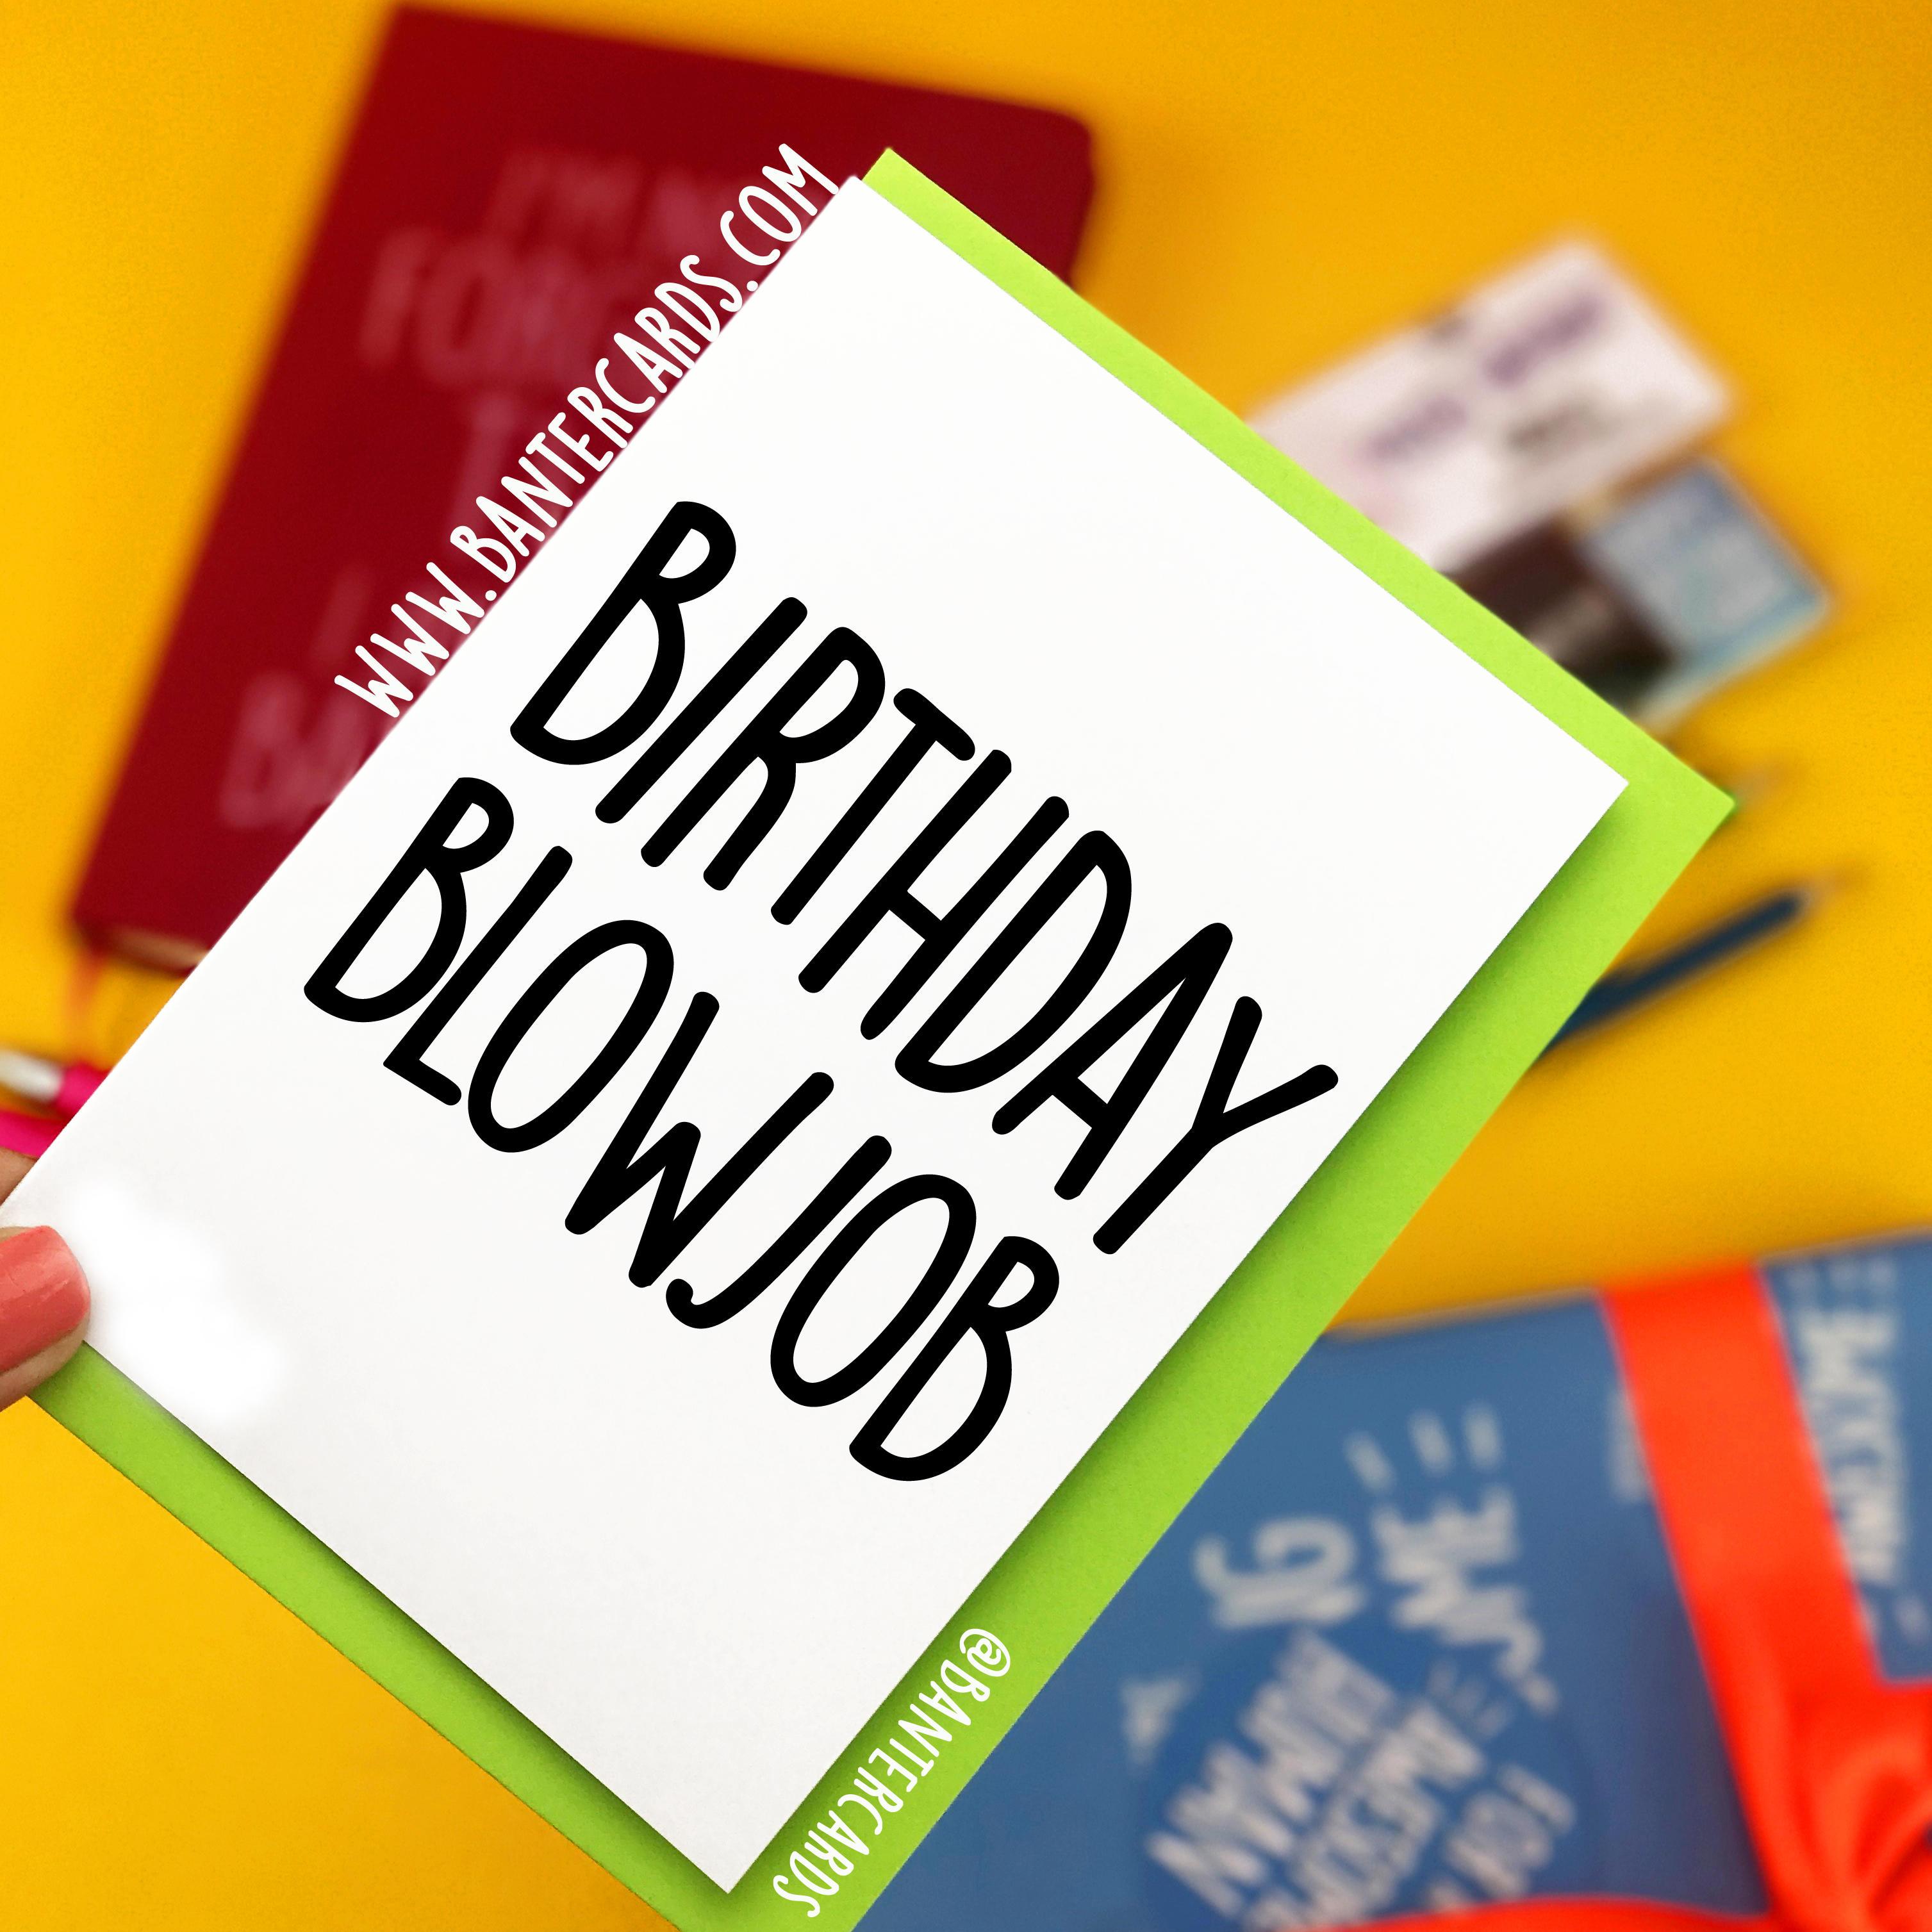 blowjob for birthday